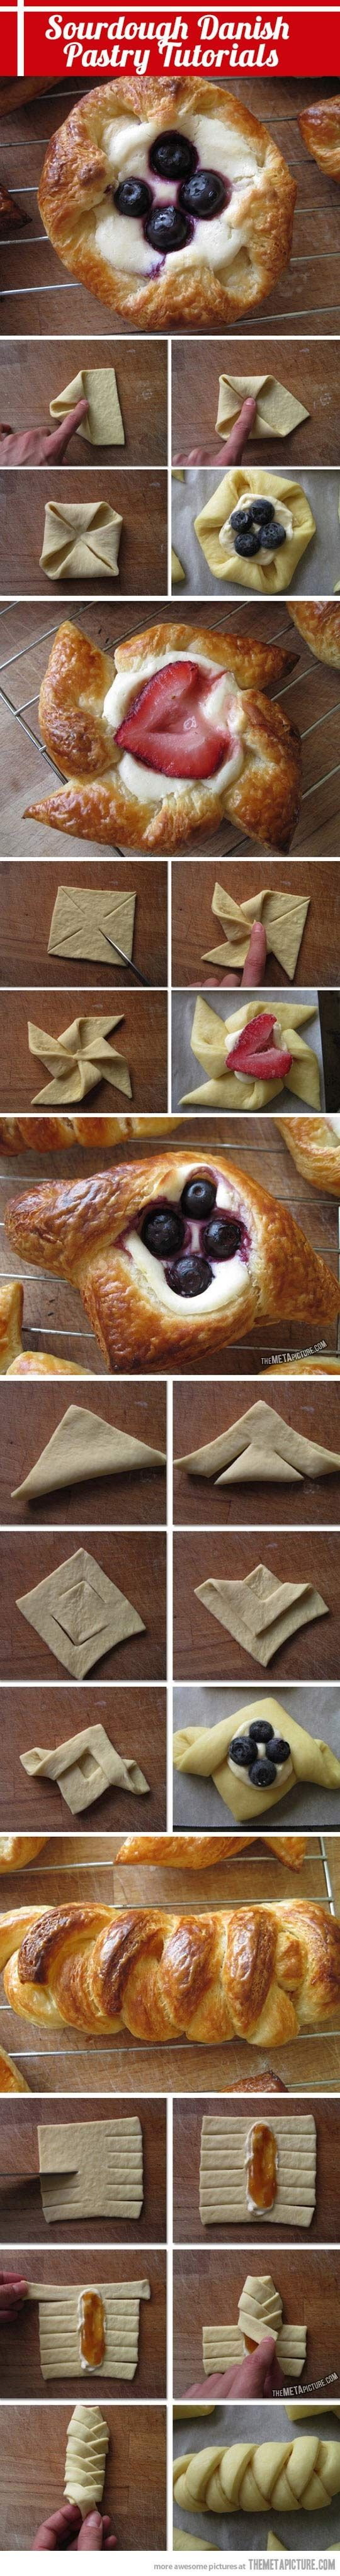 pinterest | shelby_taylor11 | sourdough danish pastry